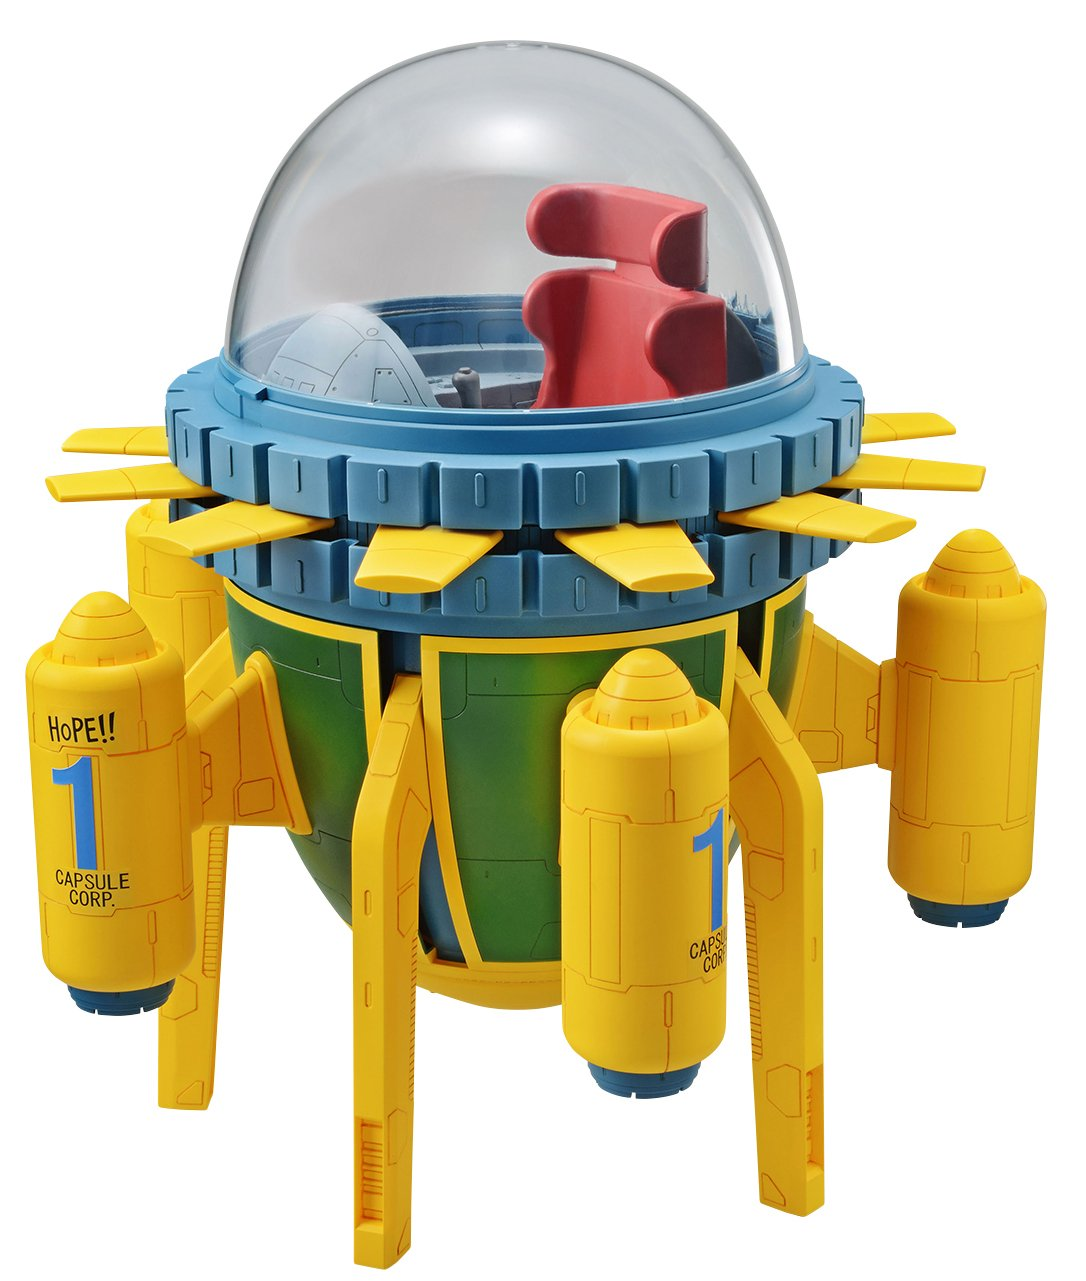 Bandai Hobby Figure-Rise Mechanics Trunks Time Machine Dragon Ball Z Maquina del Tiempo Maqueta [Requiere Montaje] 300mm Bluefin Distribution Toys us toys BAN216395